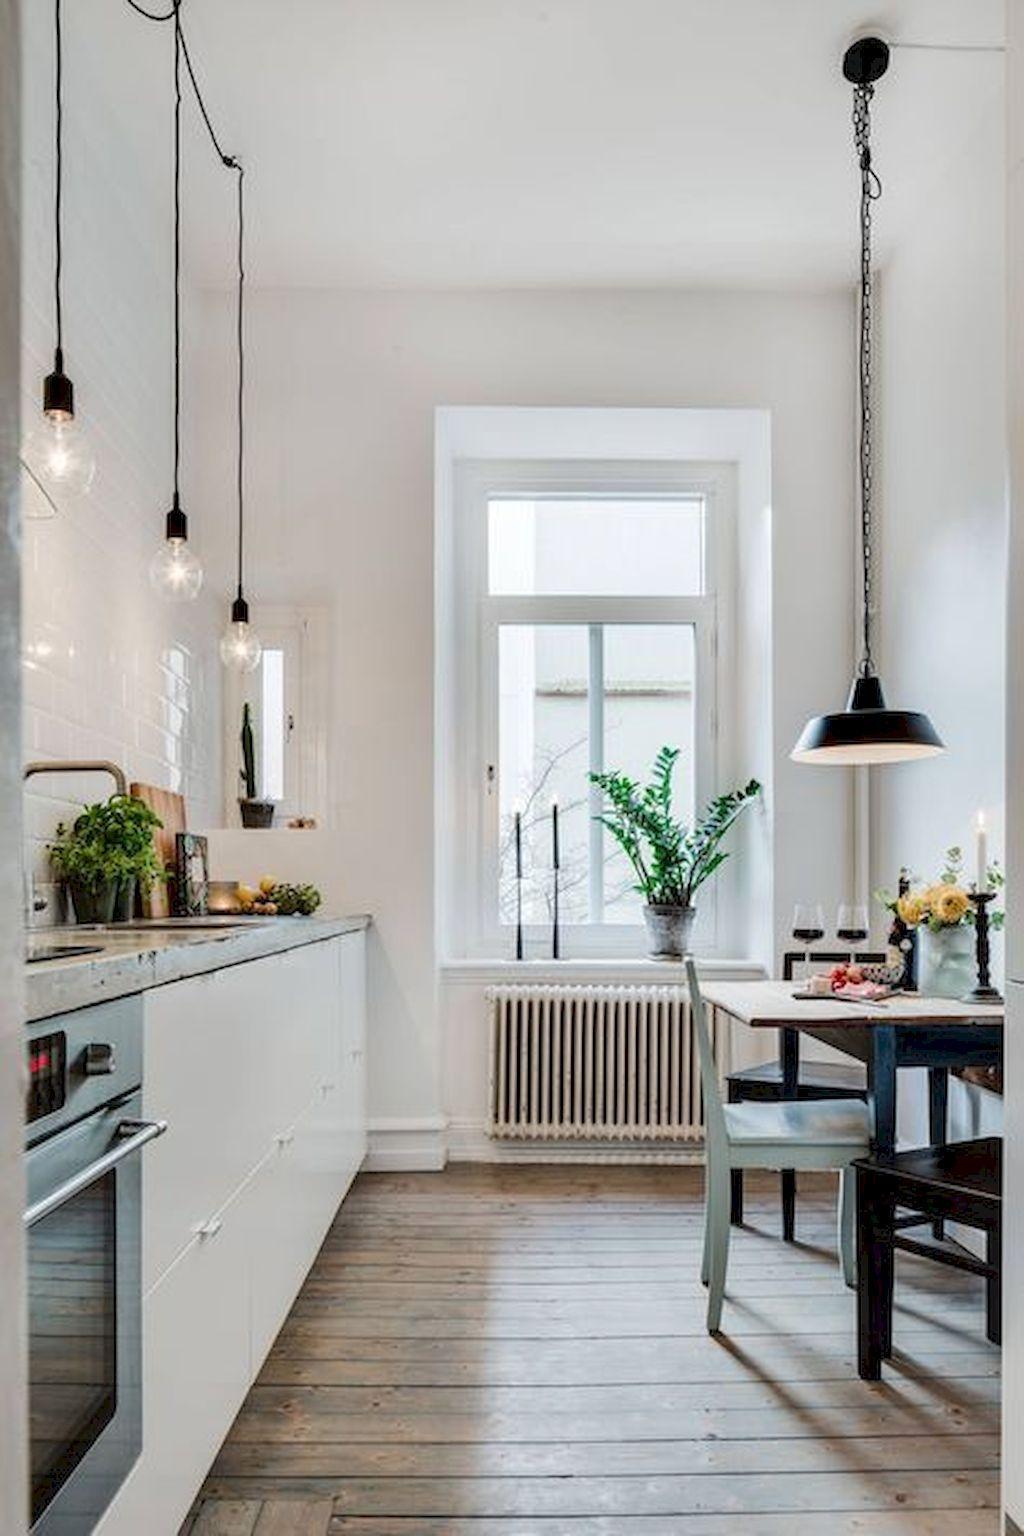 80 Spectacular Scandinavian Kitchen Ideas carrebianhomecom